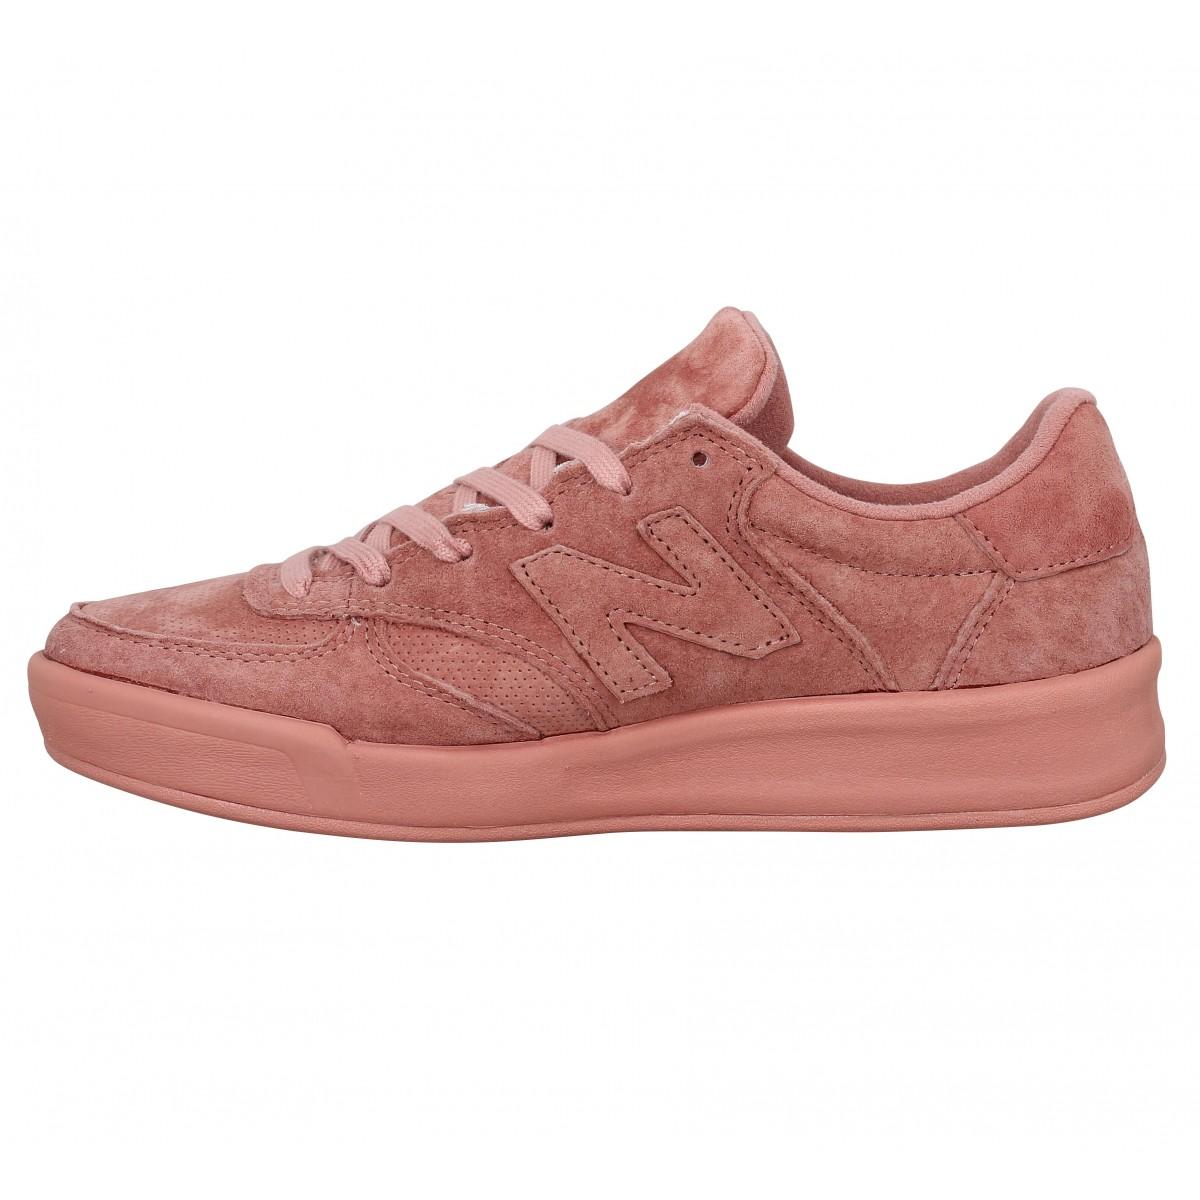 New balance wrt300 velours femme rose femme   Fanny chaussures